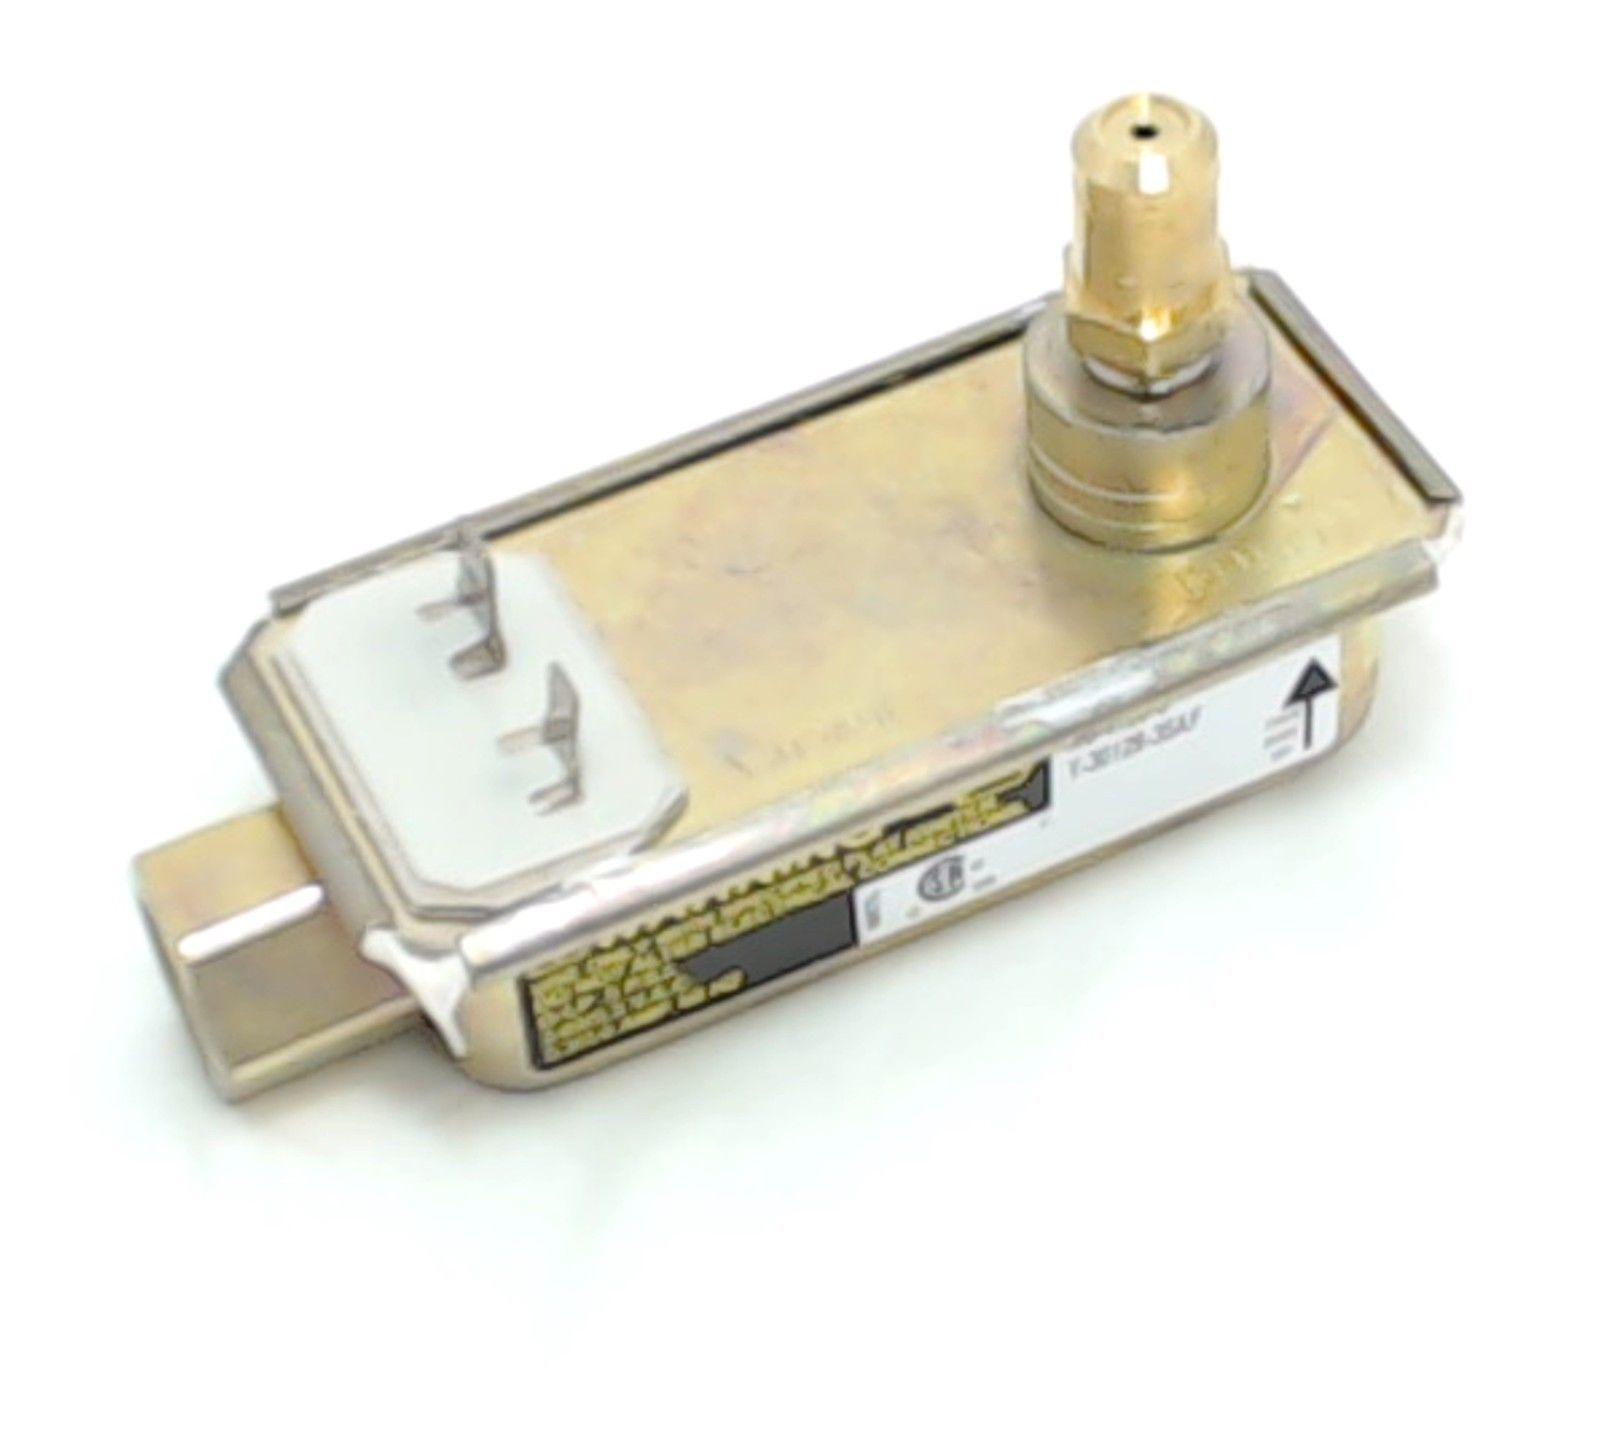 Gas Range Safety Valve Single Bimetal Frigidaire Oven Stove Repair Parts 3203459